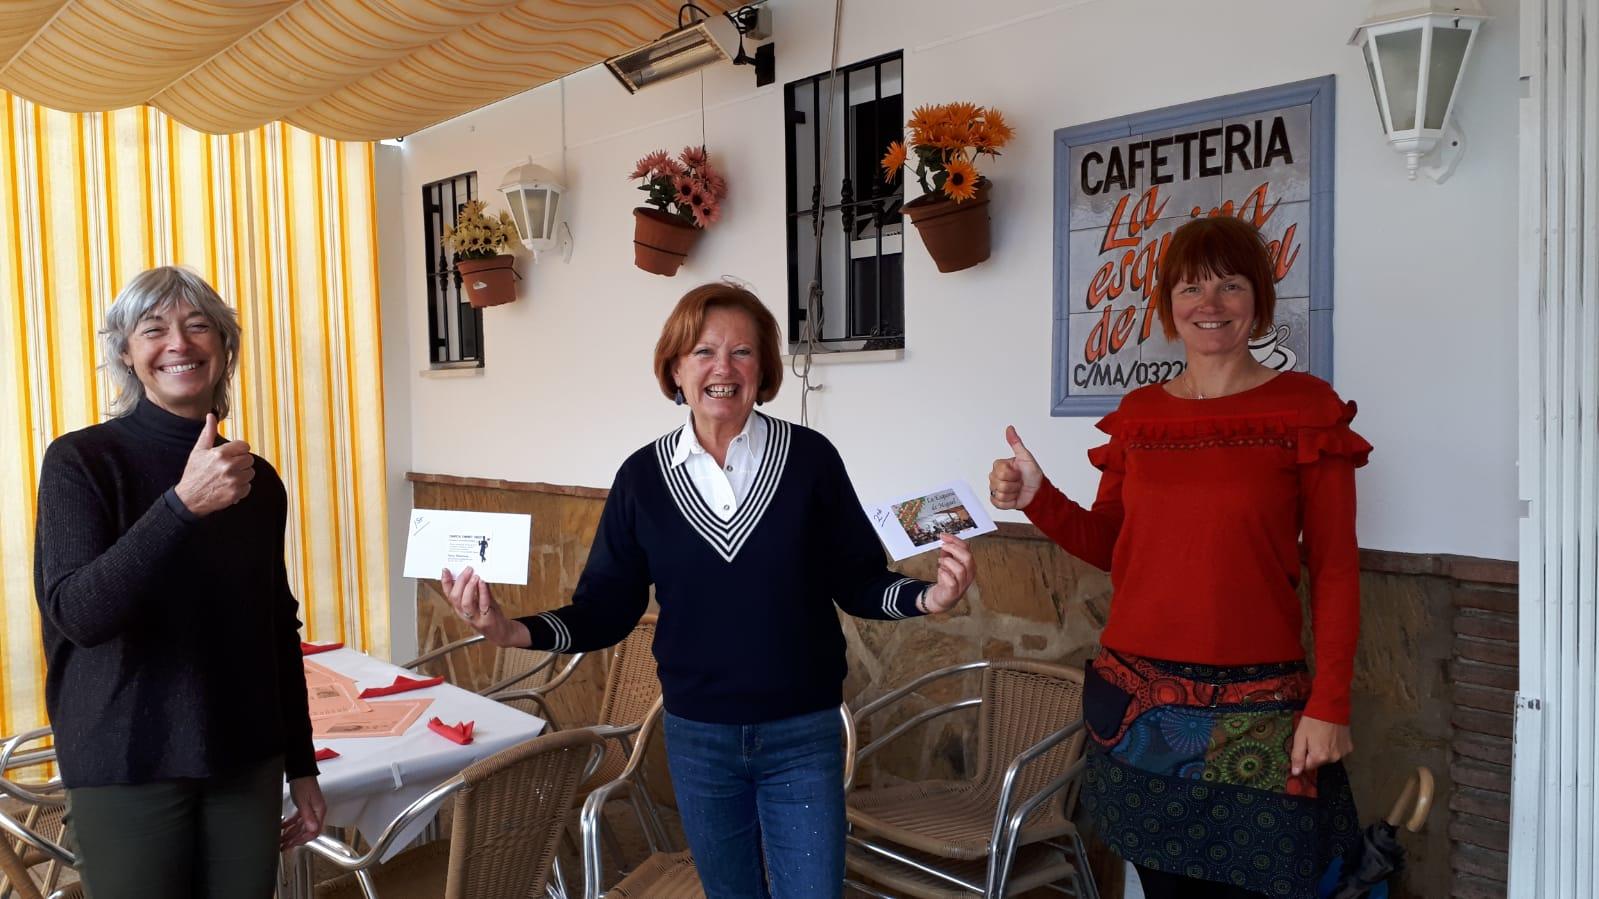 Cómpeta record strike fundraising at their Christmas Market!